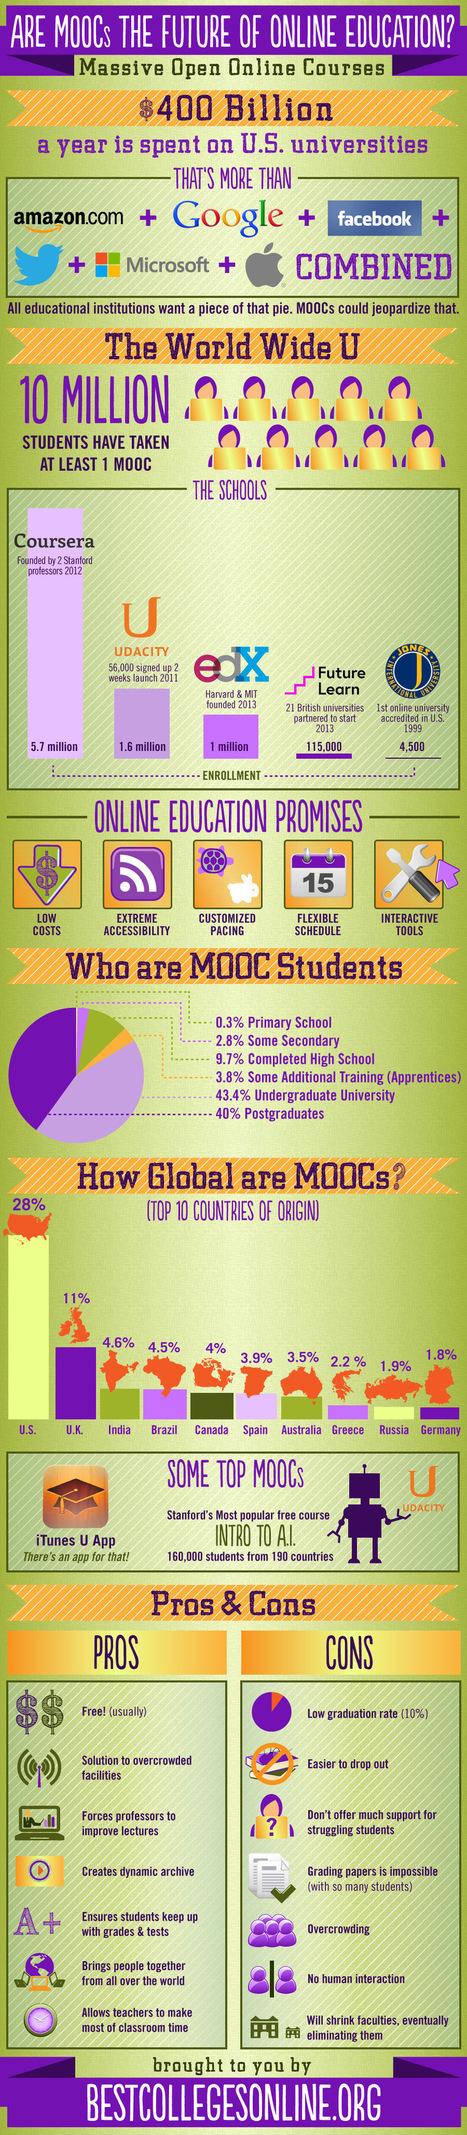 Are MOOCs the Future of Online Education? | Neli Maria Mengalli's Scoop.it! Space | Scoop.it